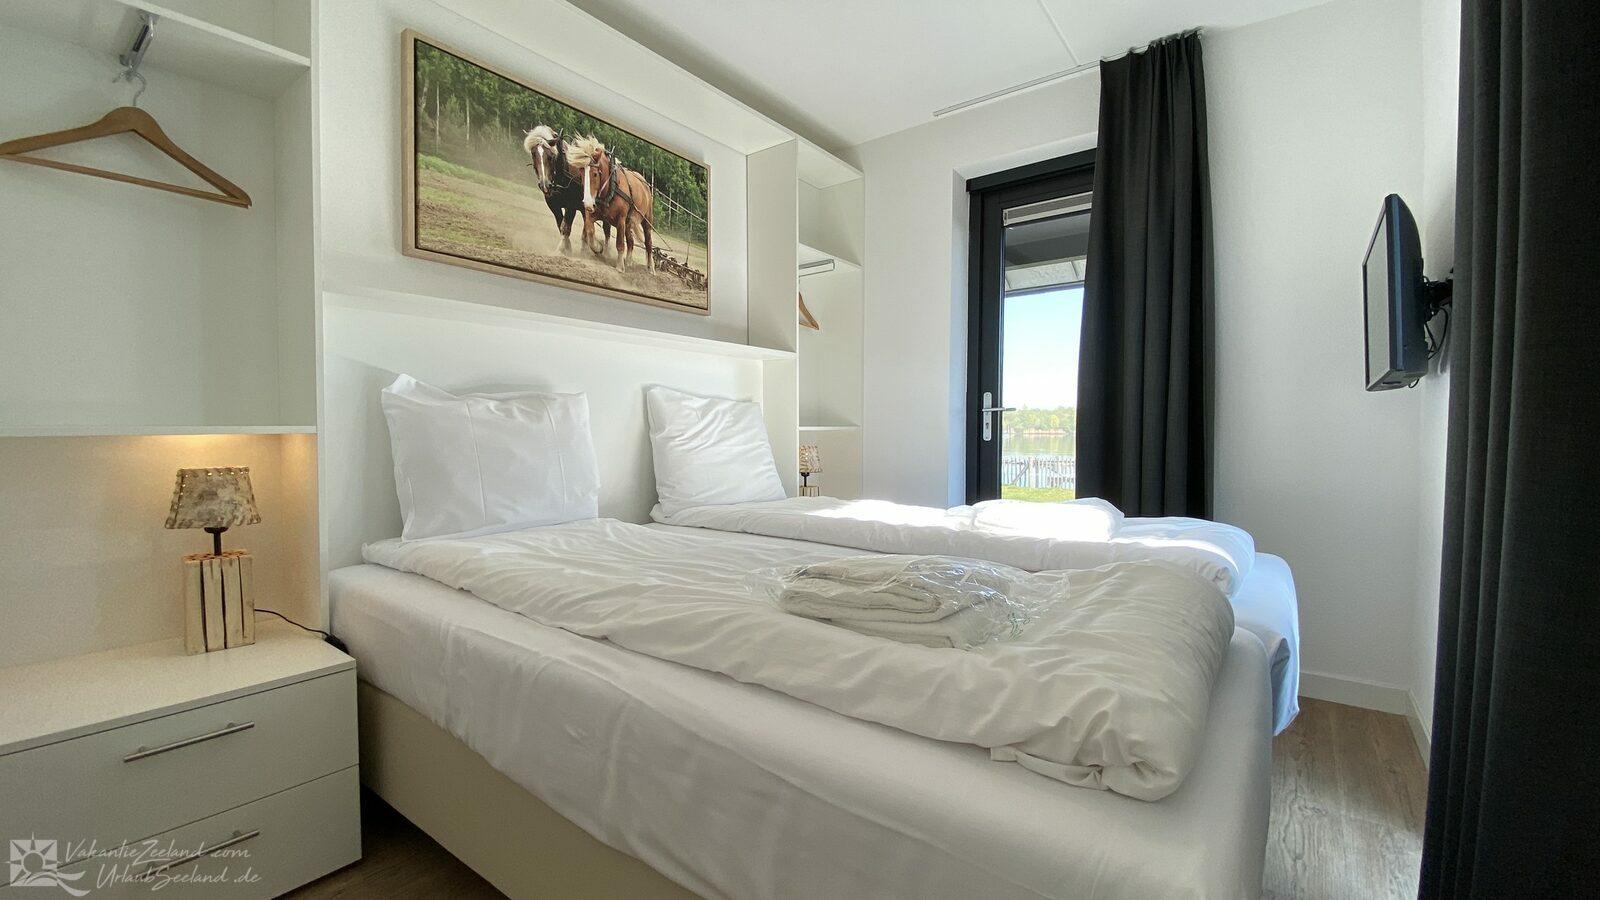 VZ746 Luxe villa Tholen